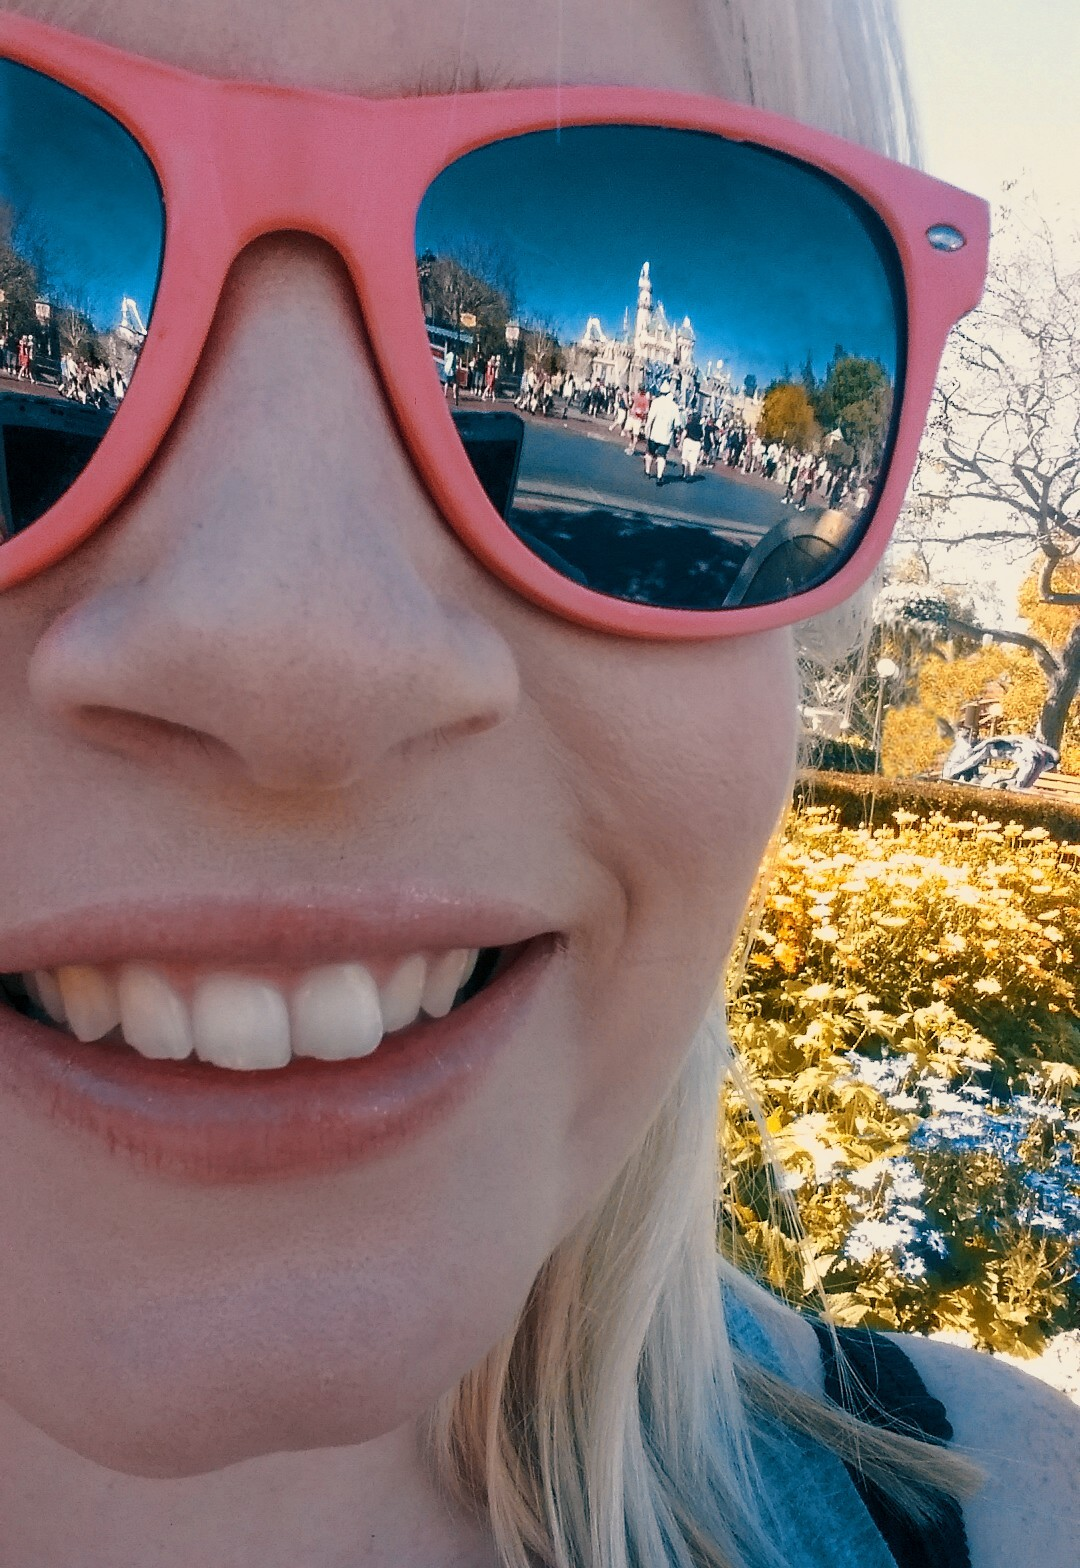 5 days in LA Los Angeles itinerary Disneyland